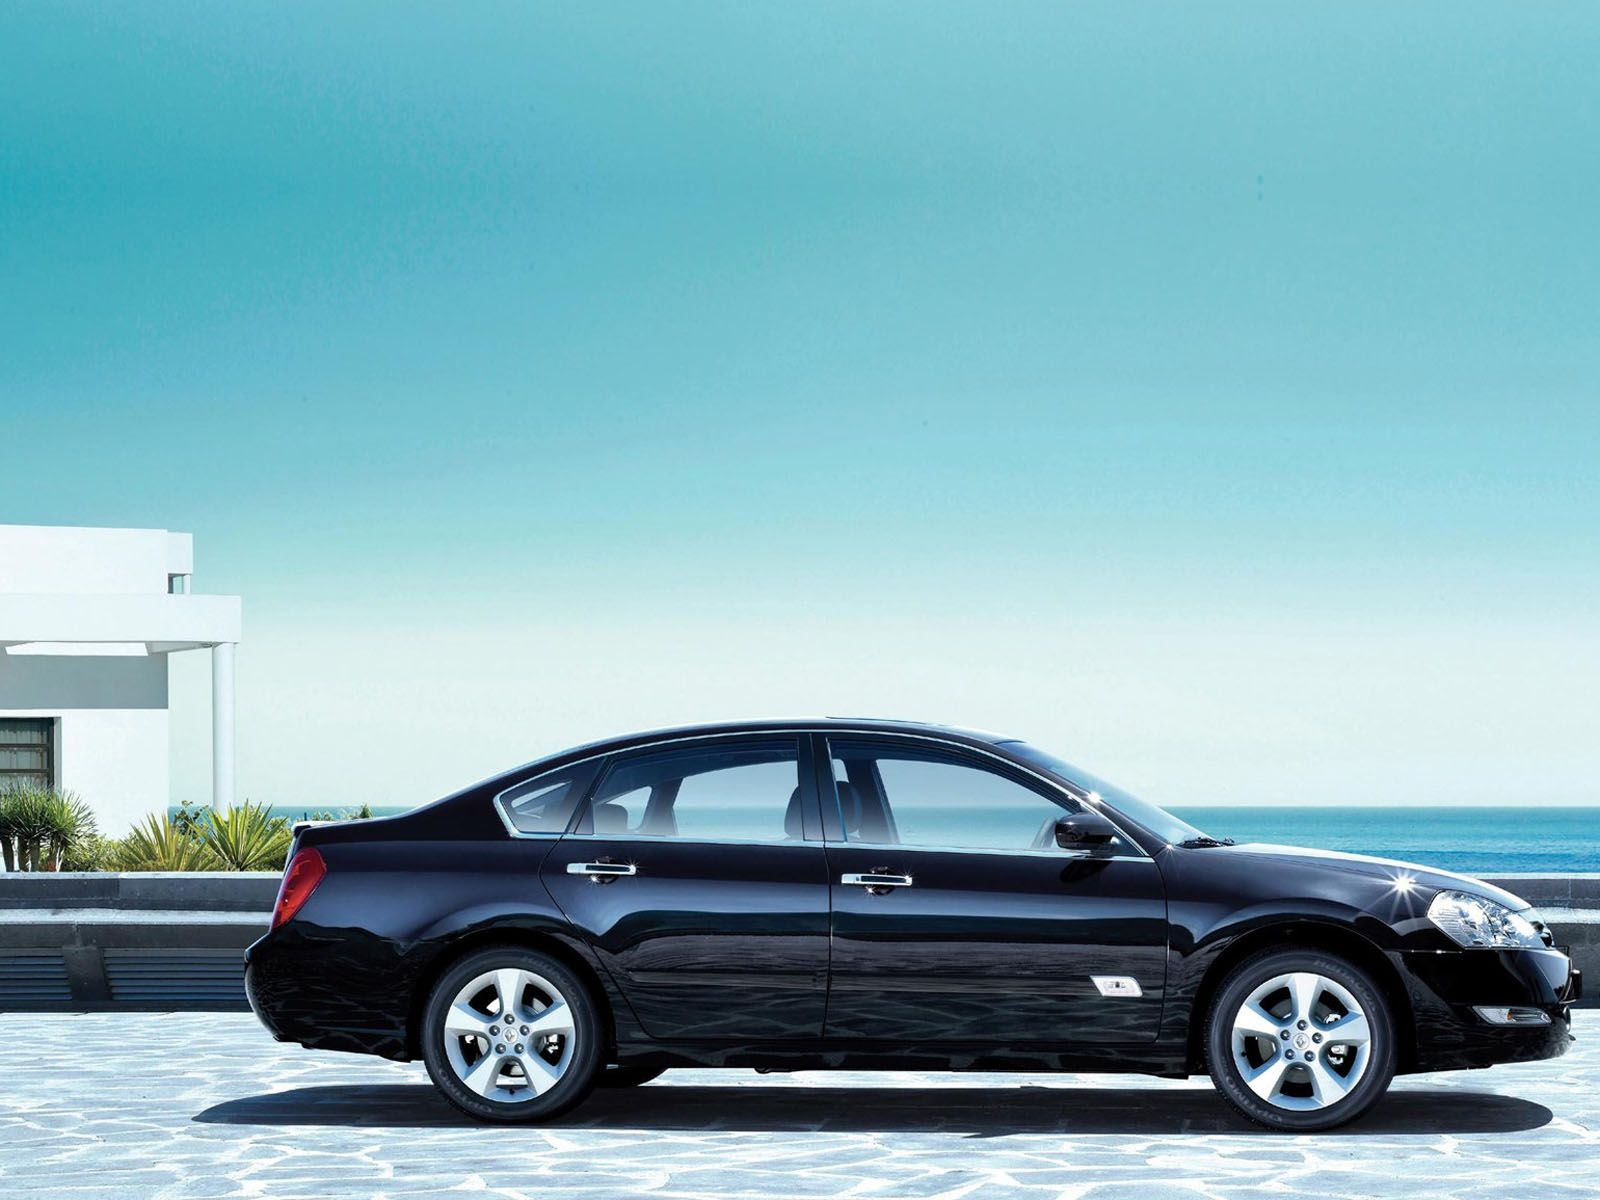 Renault Safrane (2009) - Side View